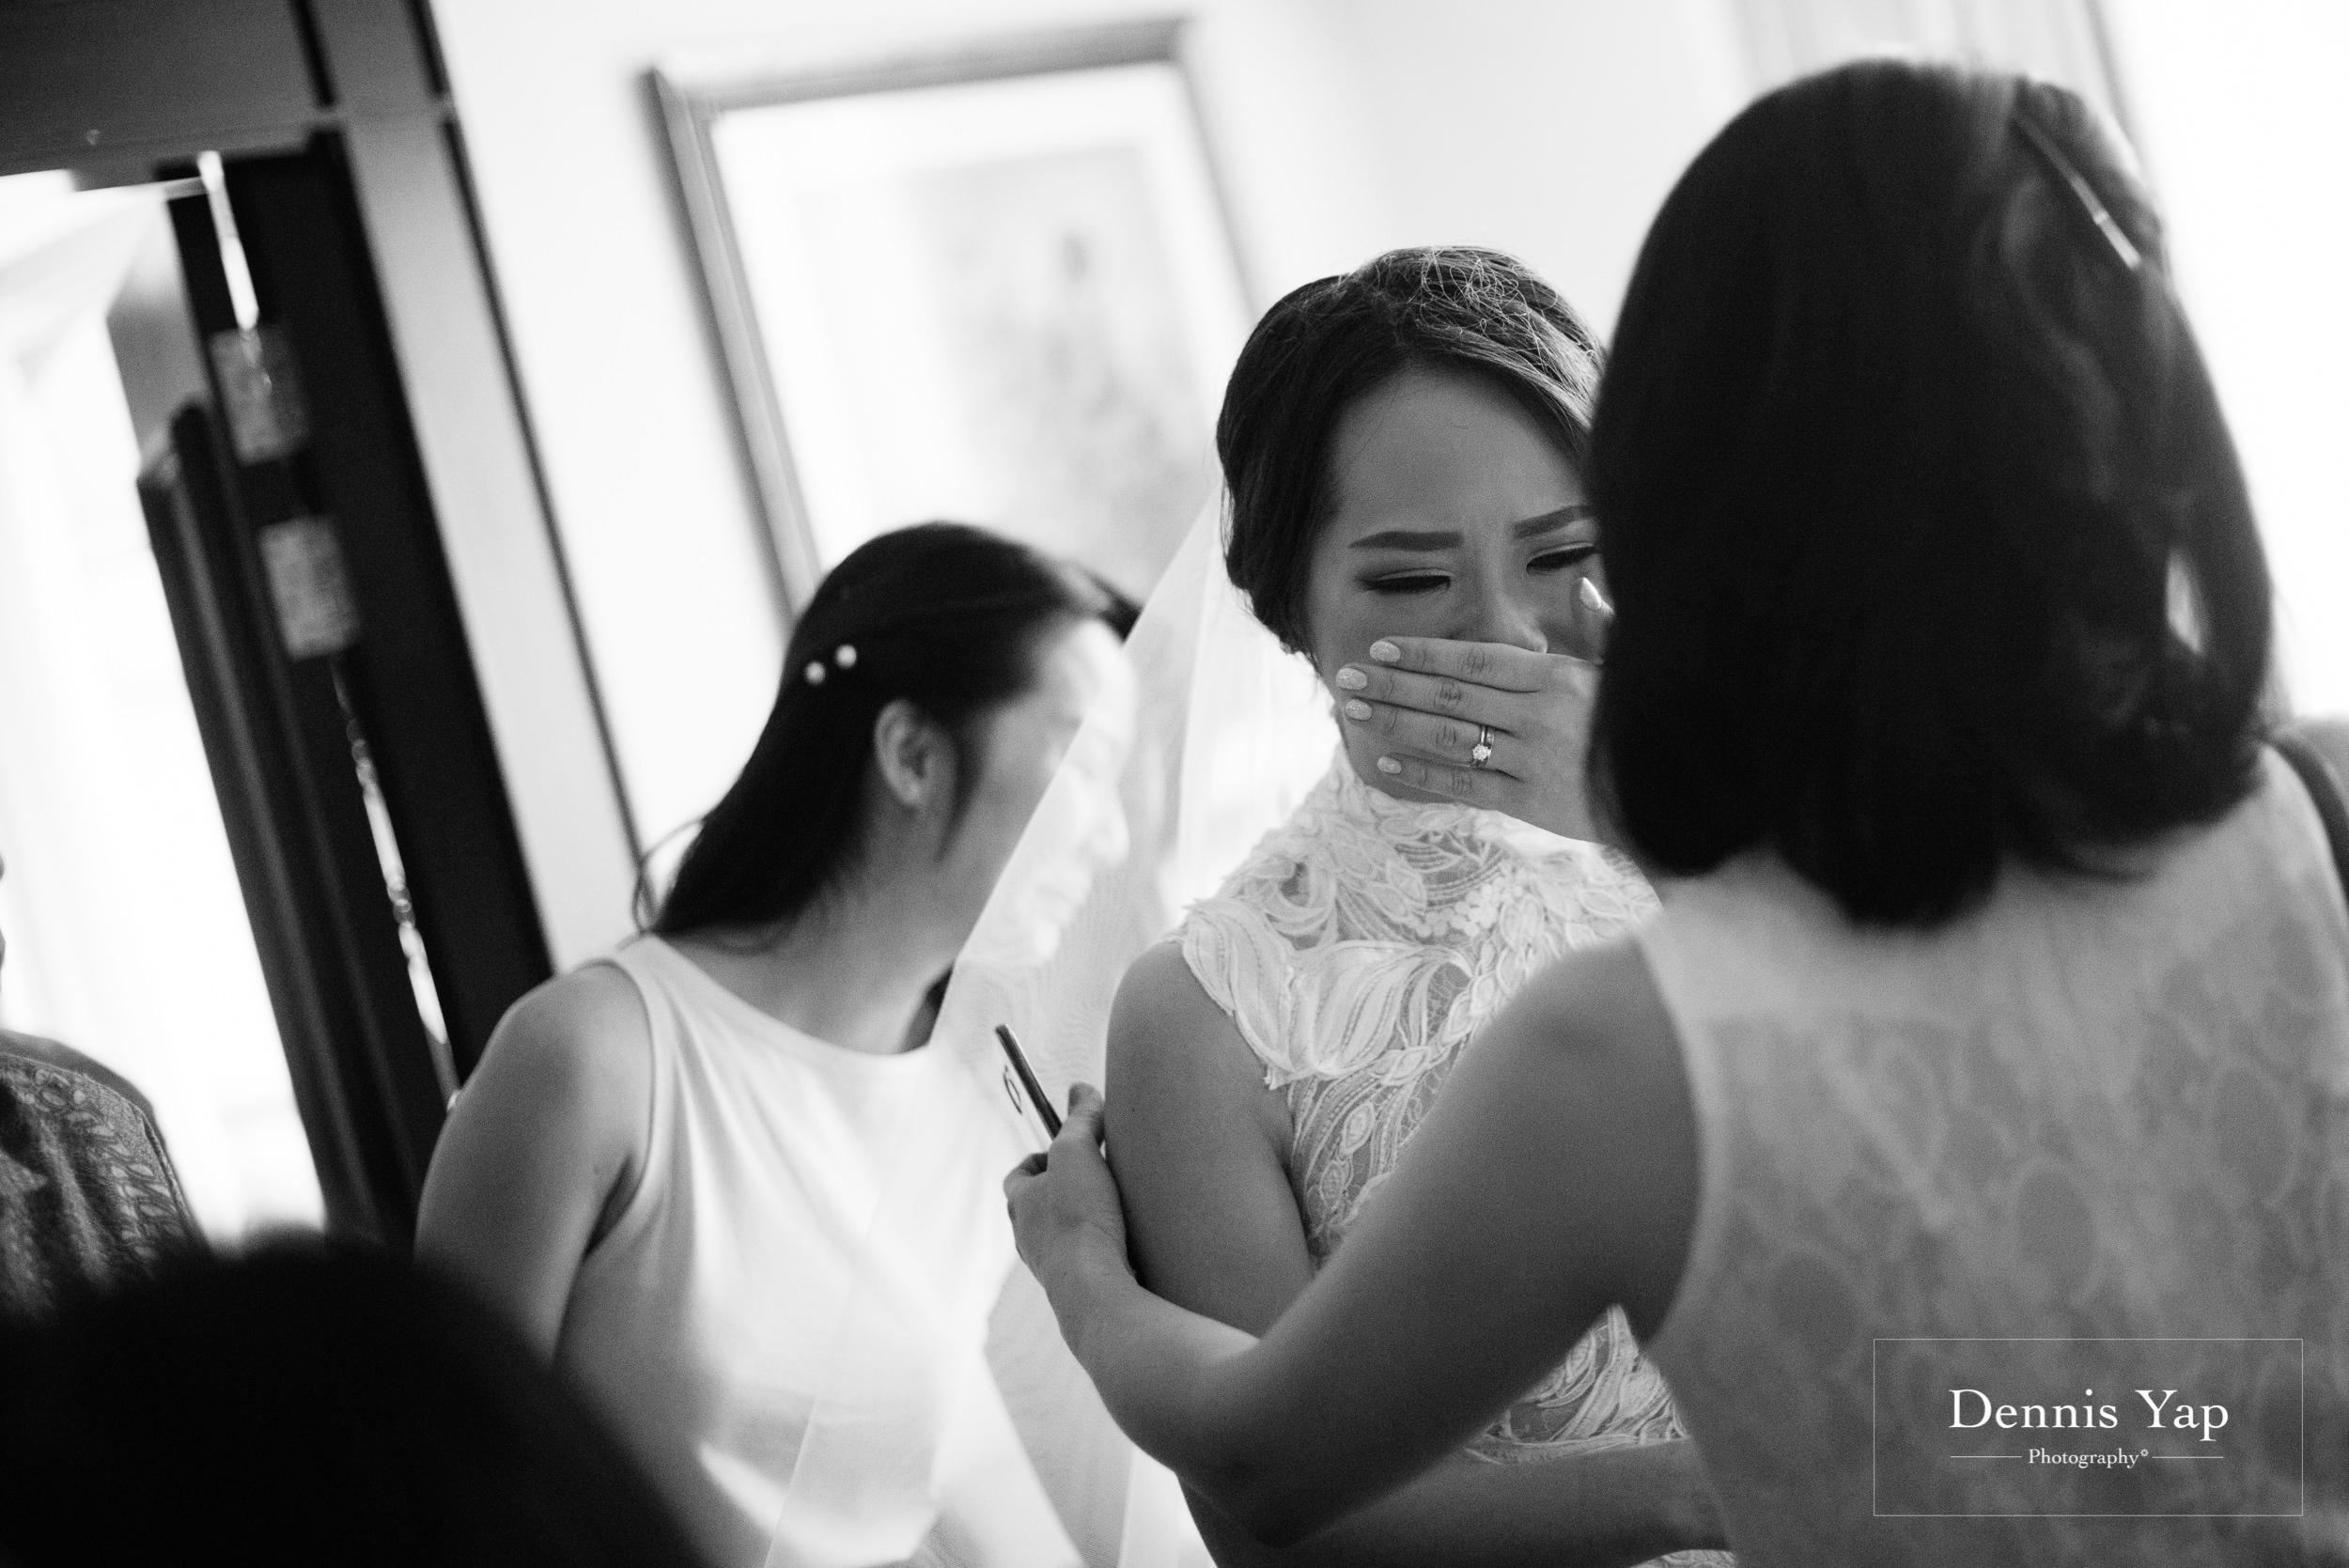 keat mandy wedding day marriot putrajaya dennis yap malaysia wedding photographer-8.jpg